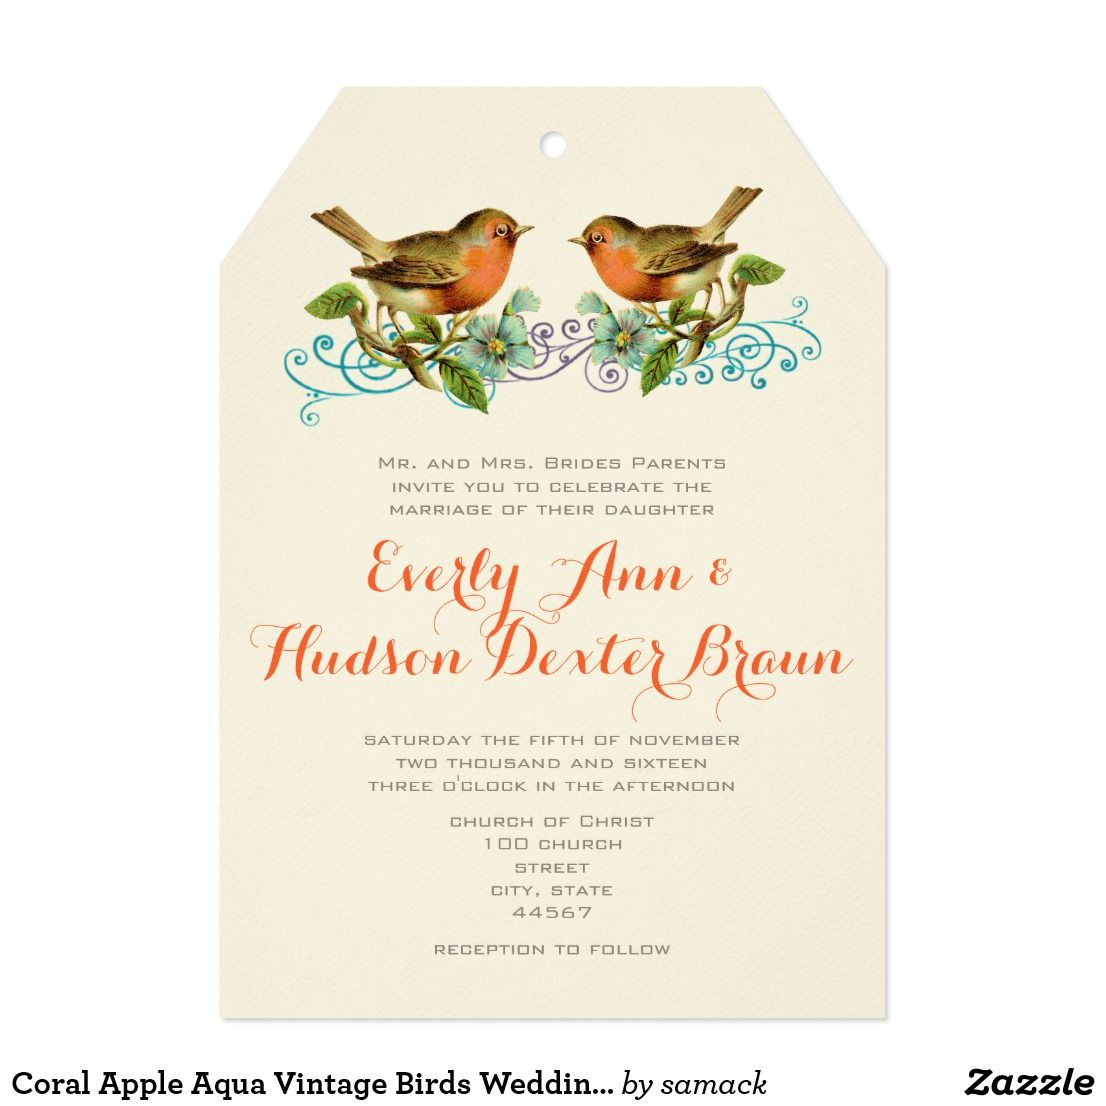 Coral Apple Aqua Vintage Birds Wedding Invitation | Invites wedding ...